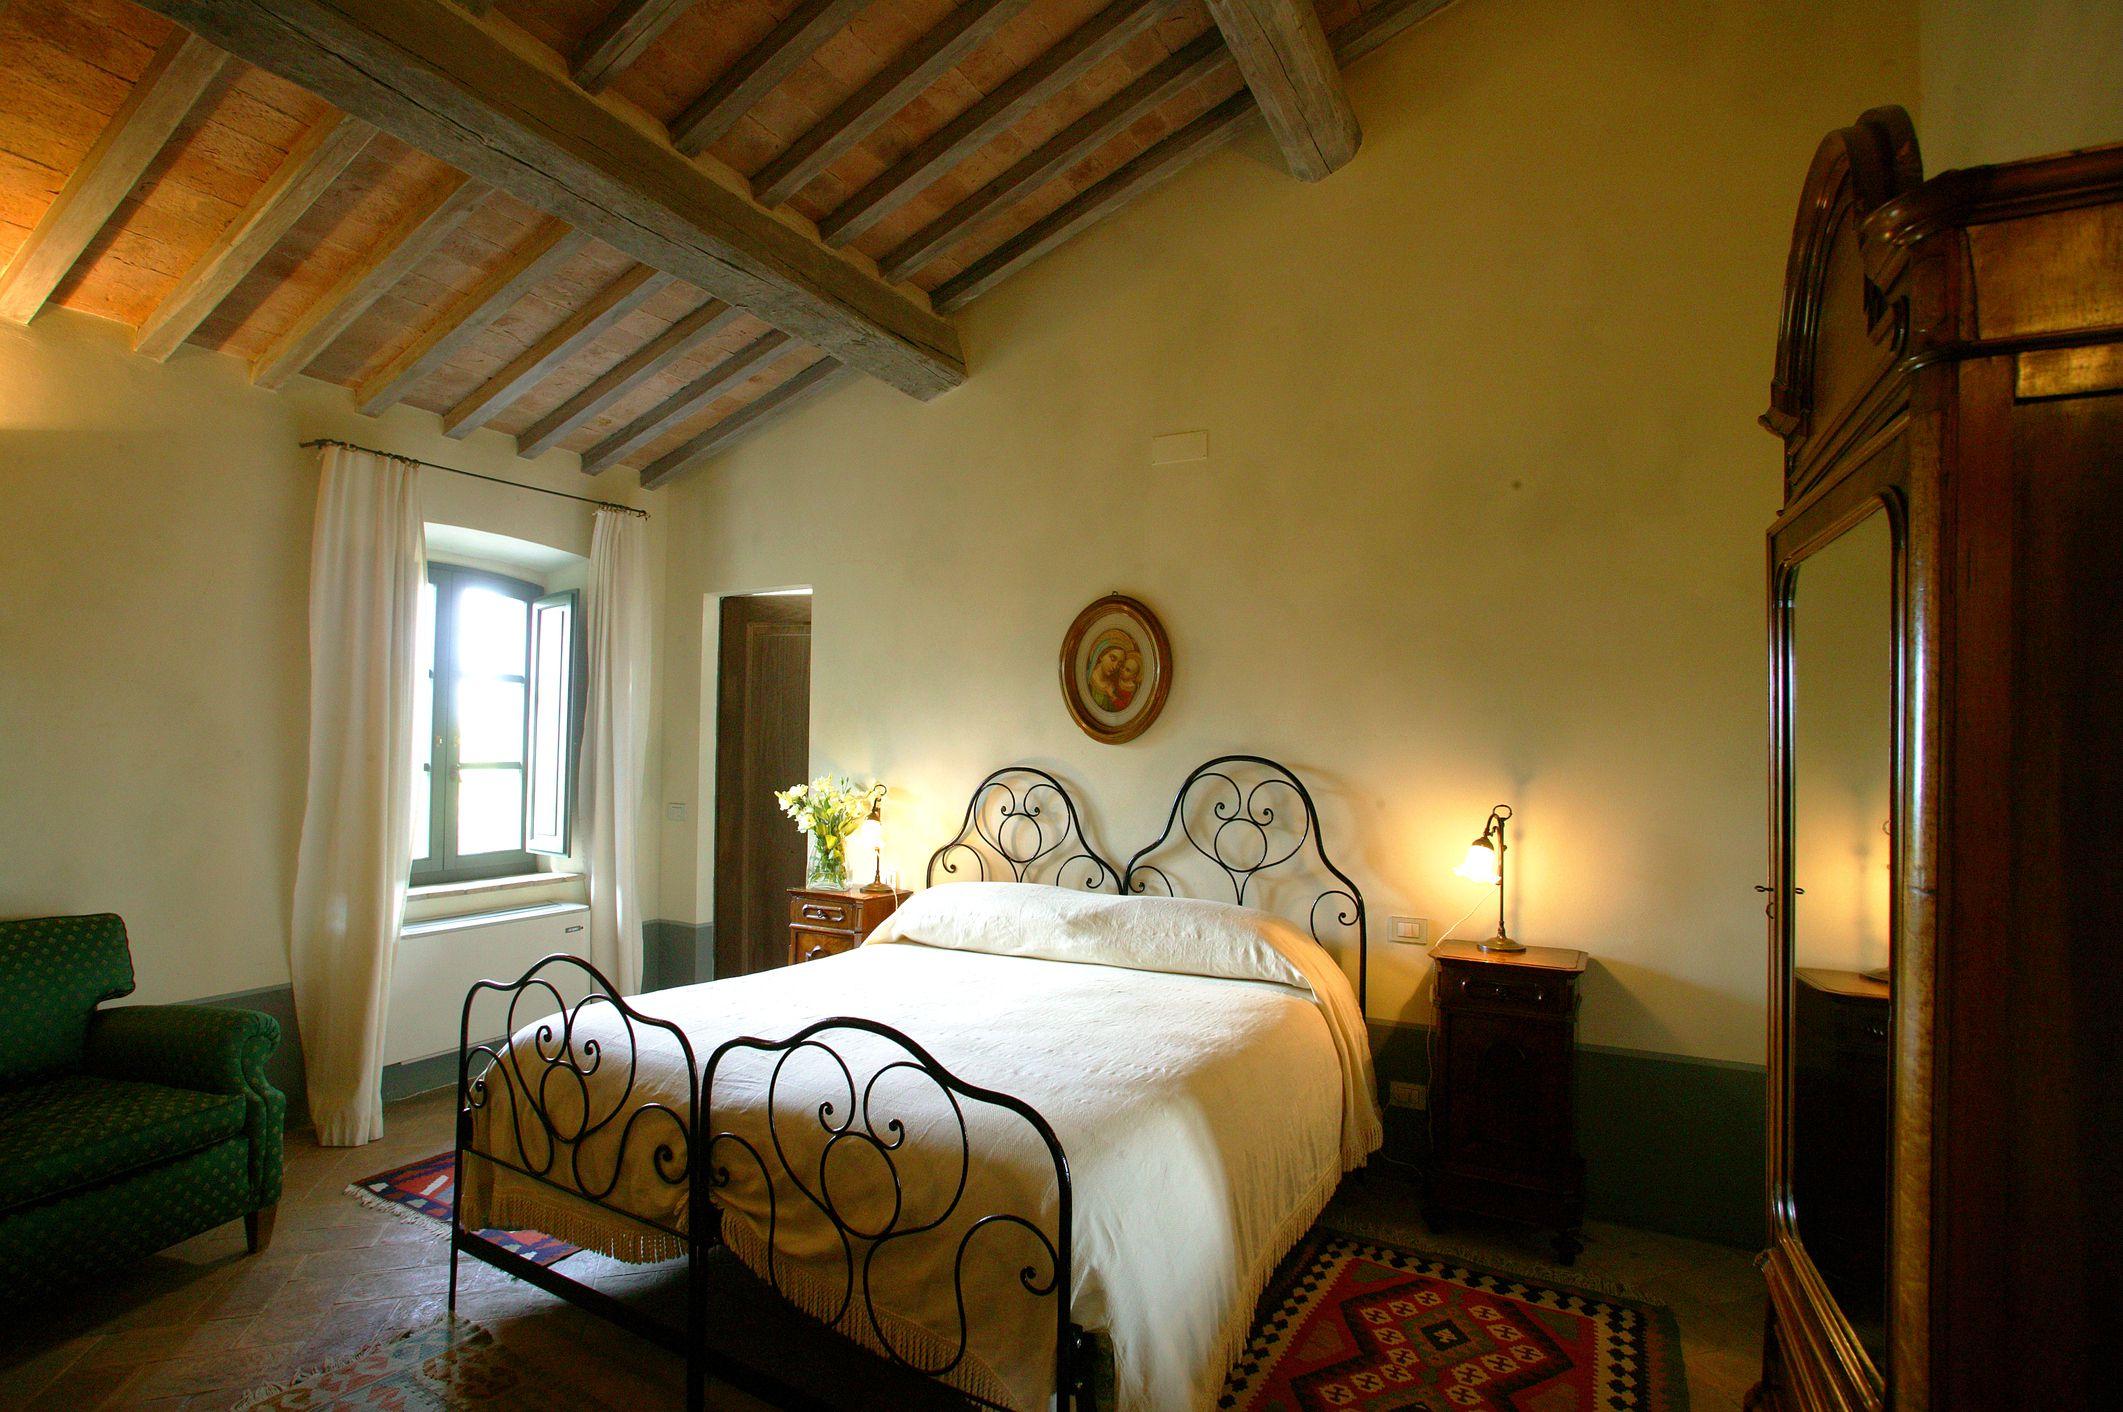 https://www.thespruce.com/thmb/cxxQwyBm5Lh9tvTYJ_jT50qyuRg=/2123x1412/filters:fill(auto,1)/charming-bedroom-on-tuscan-farm-541215344-5a7c8be0c064710037f17c3e.jpg